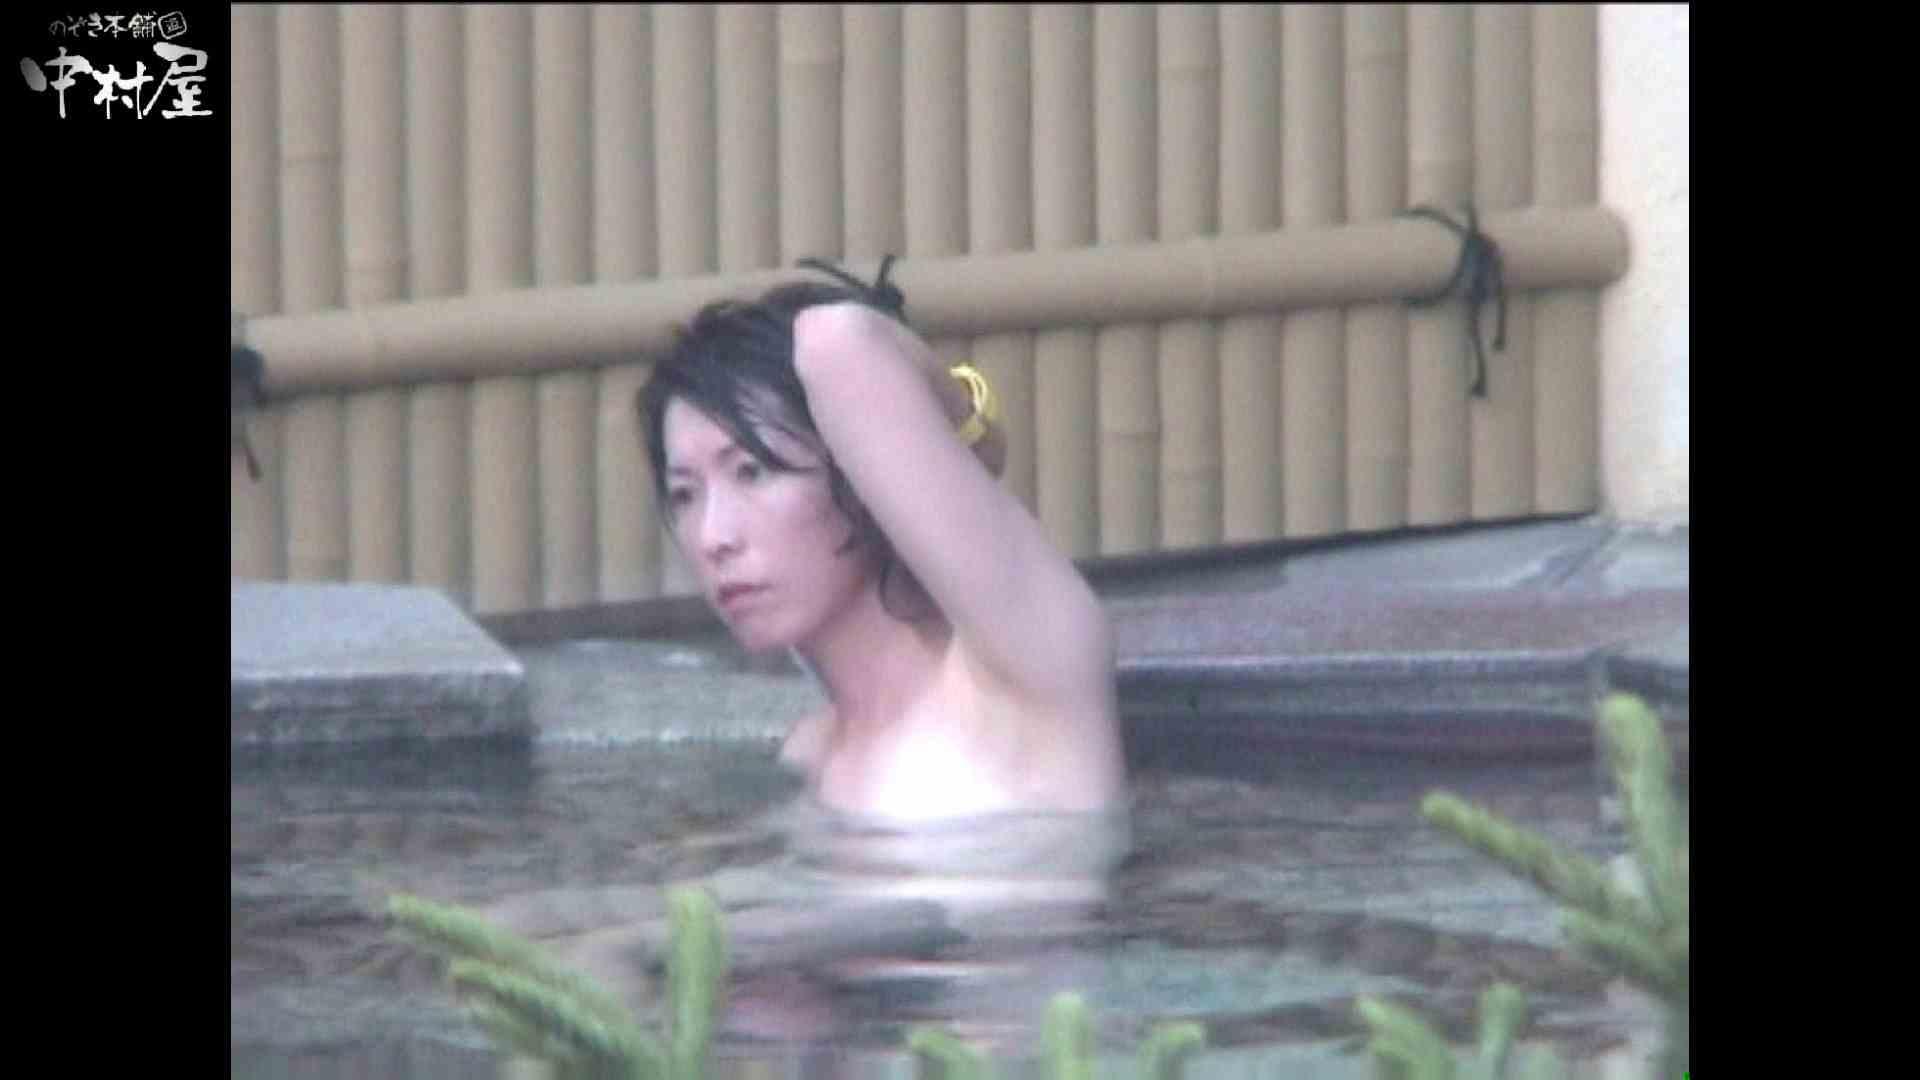 Aquaな露天風呂Vol.987 盗撮 | OLセックス  71画像 16